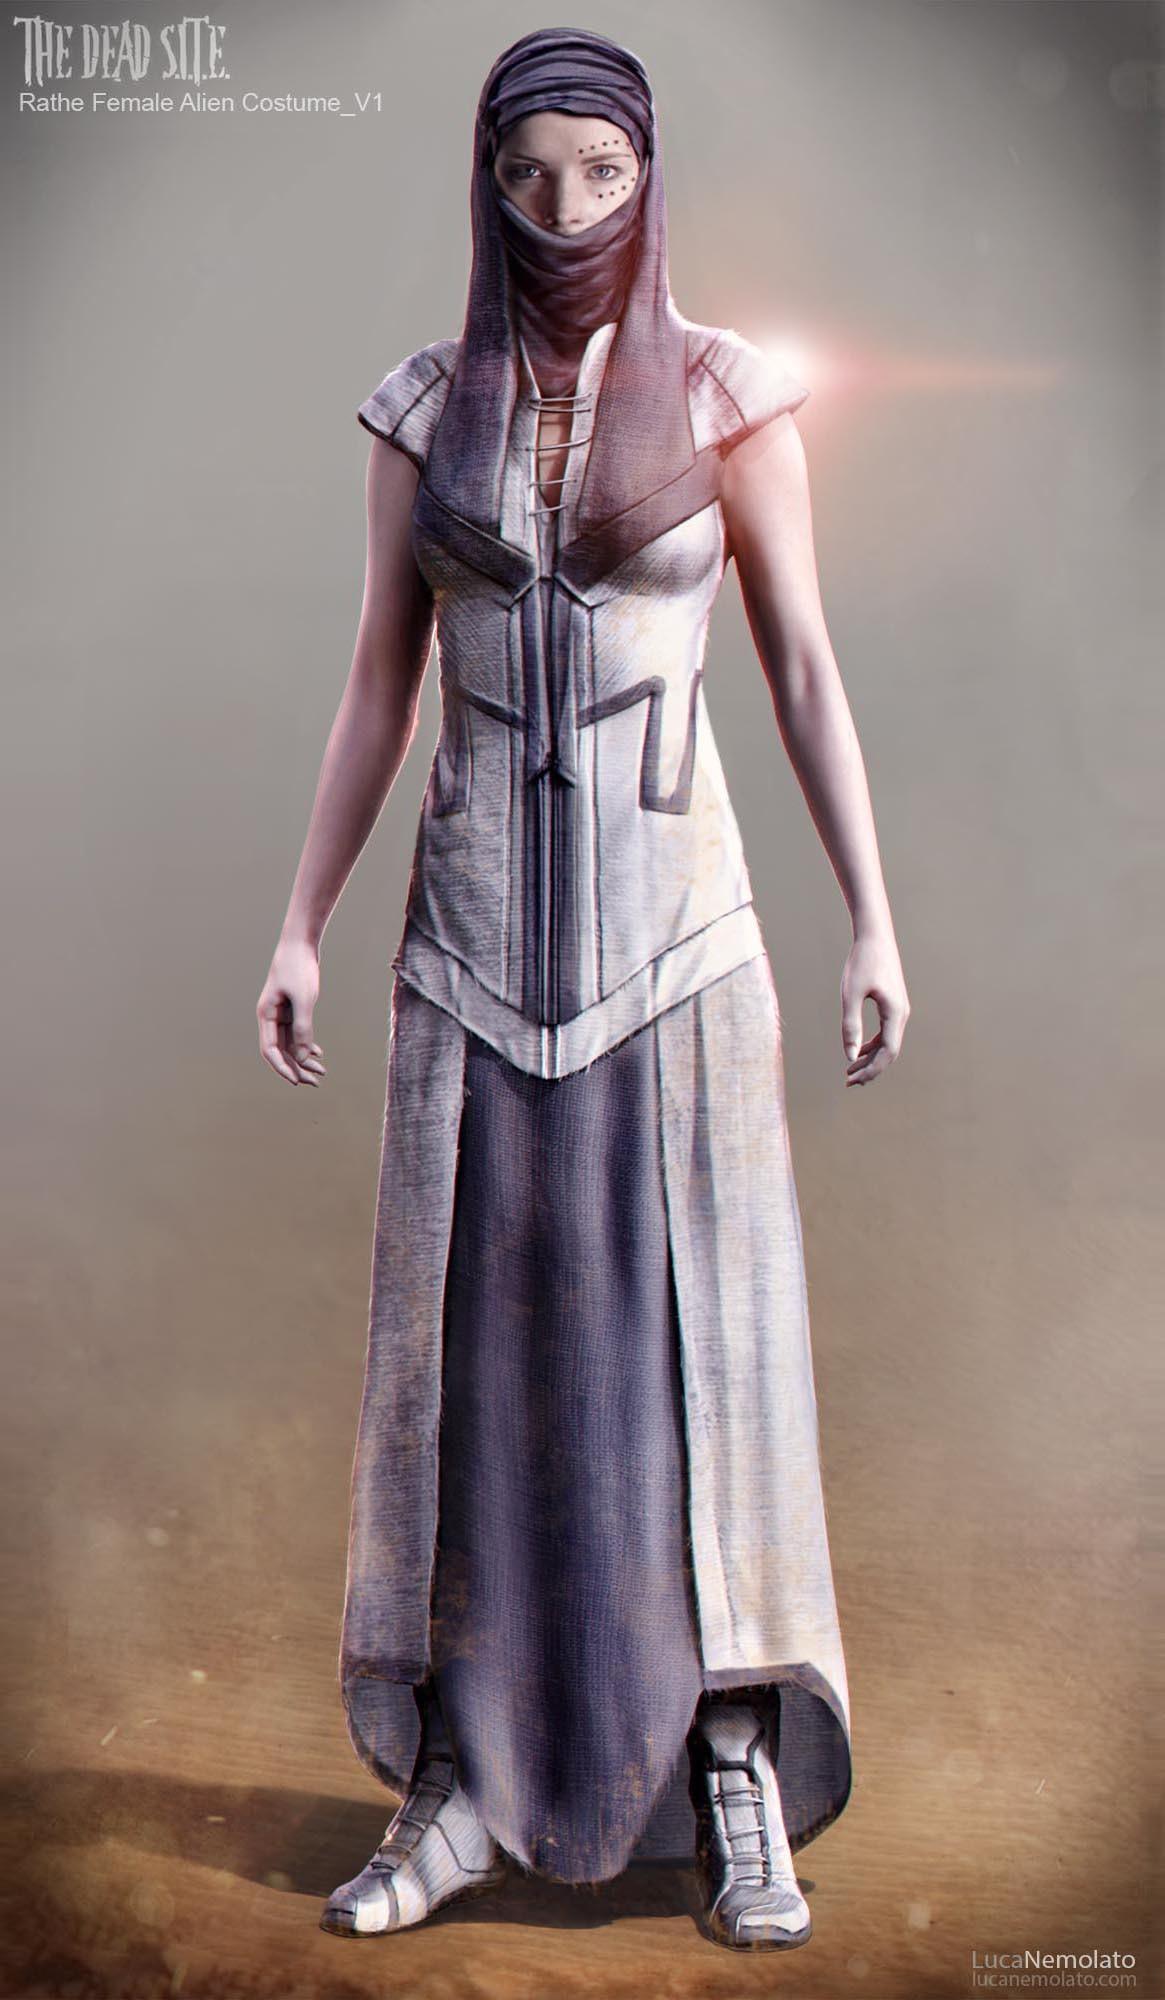 Female Alien Costume